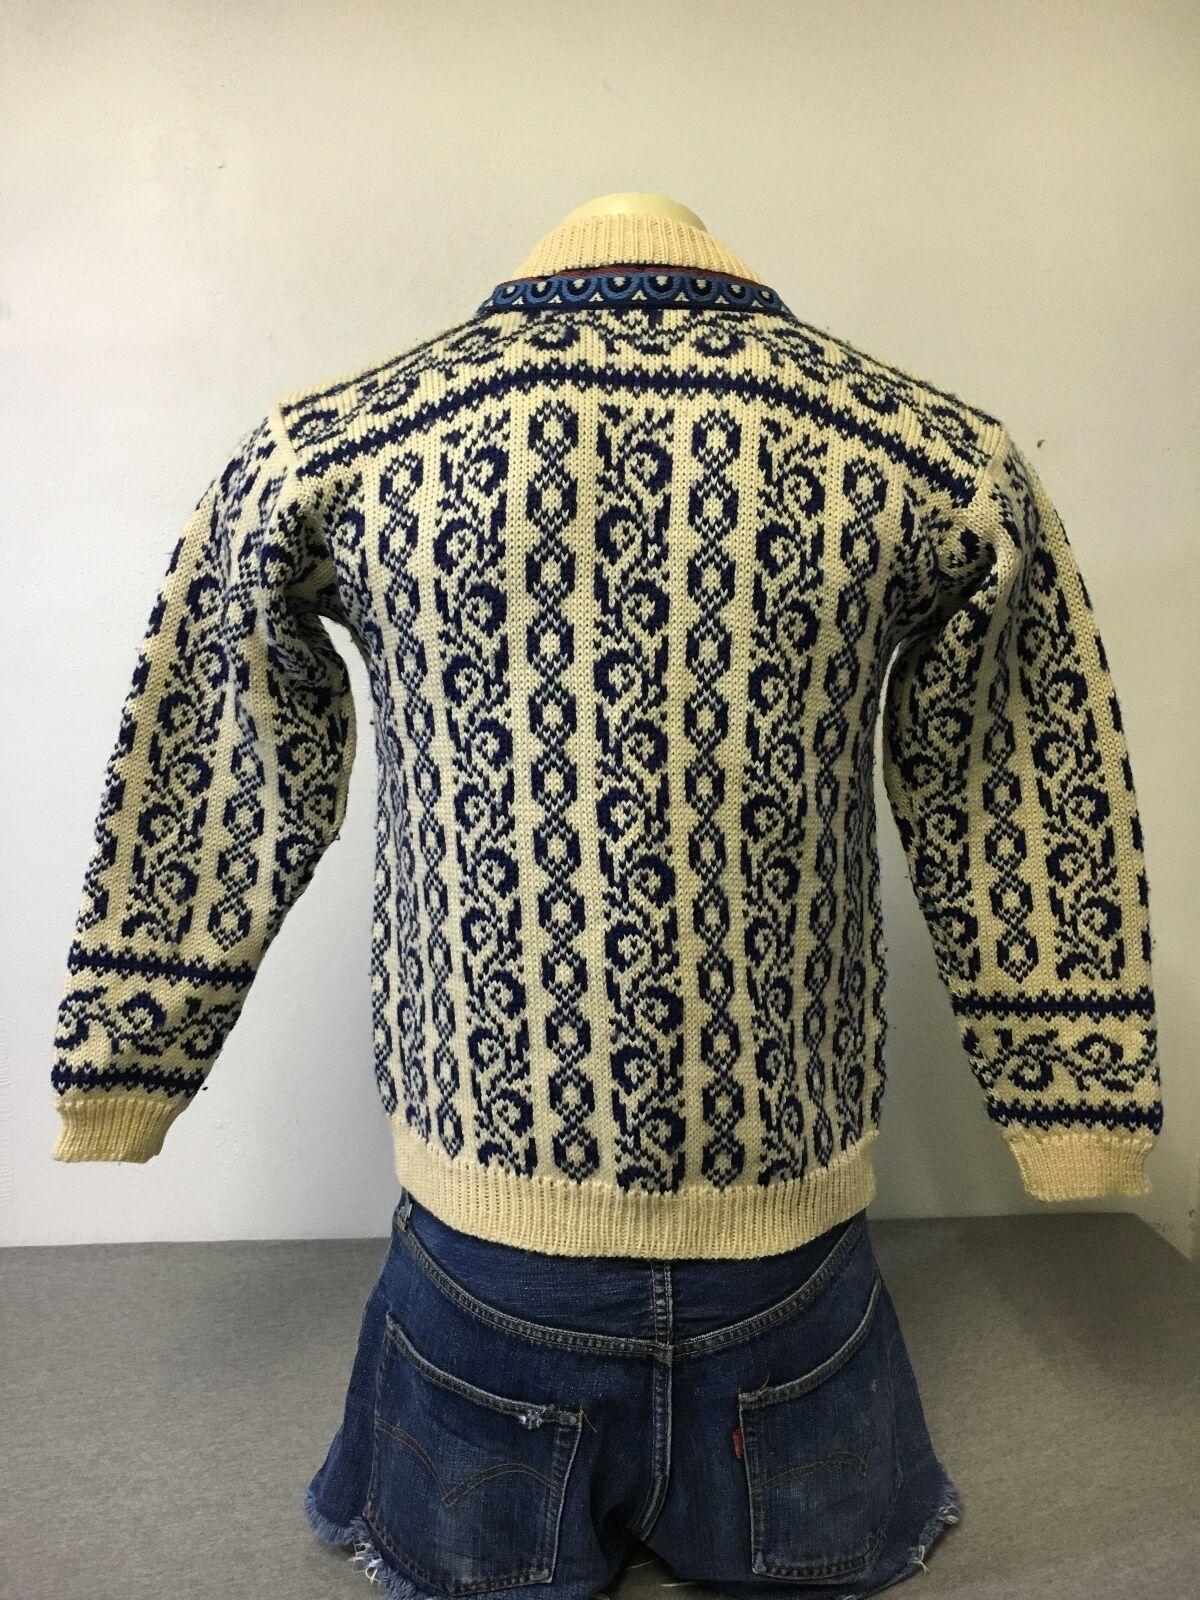 DALE OF NORWAY SWEATER SETESDFAL 100% Wool Knit Cardigan Cardigan Cardigan Pewter Clasp Warm Sz 40 c120e4